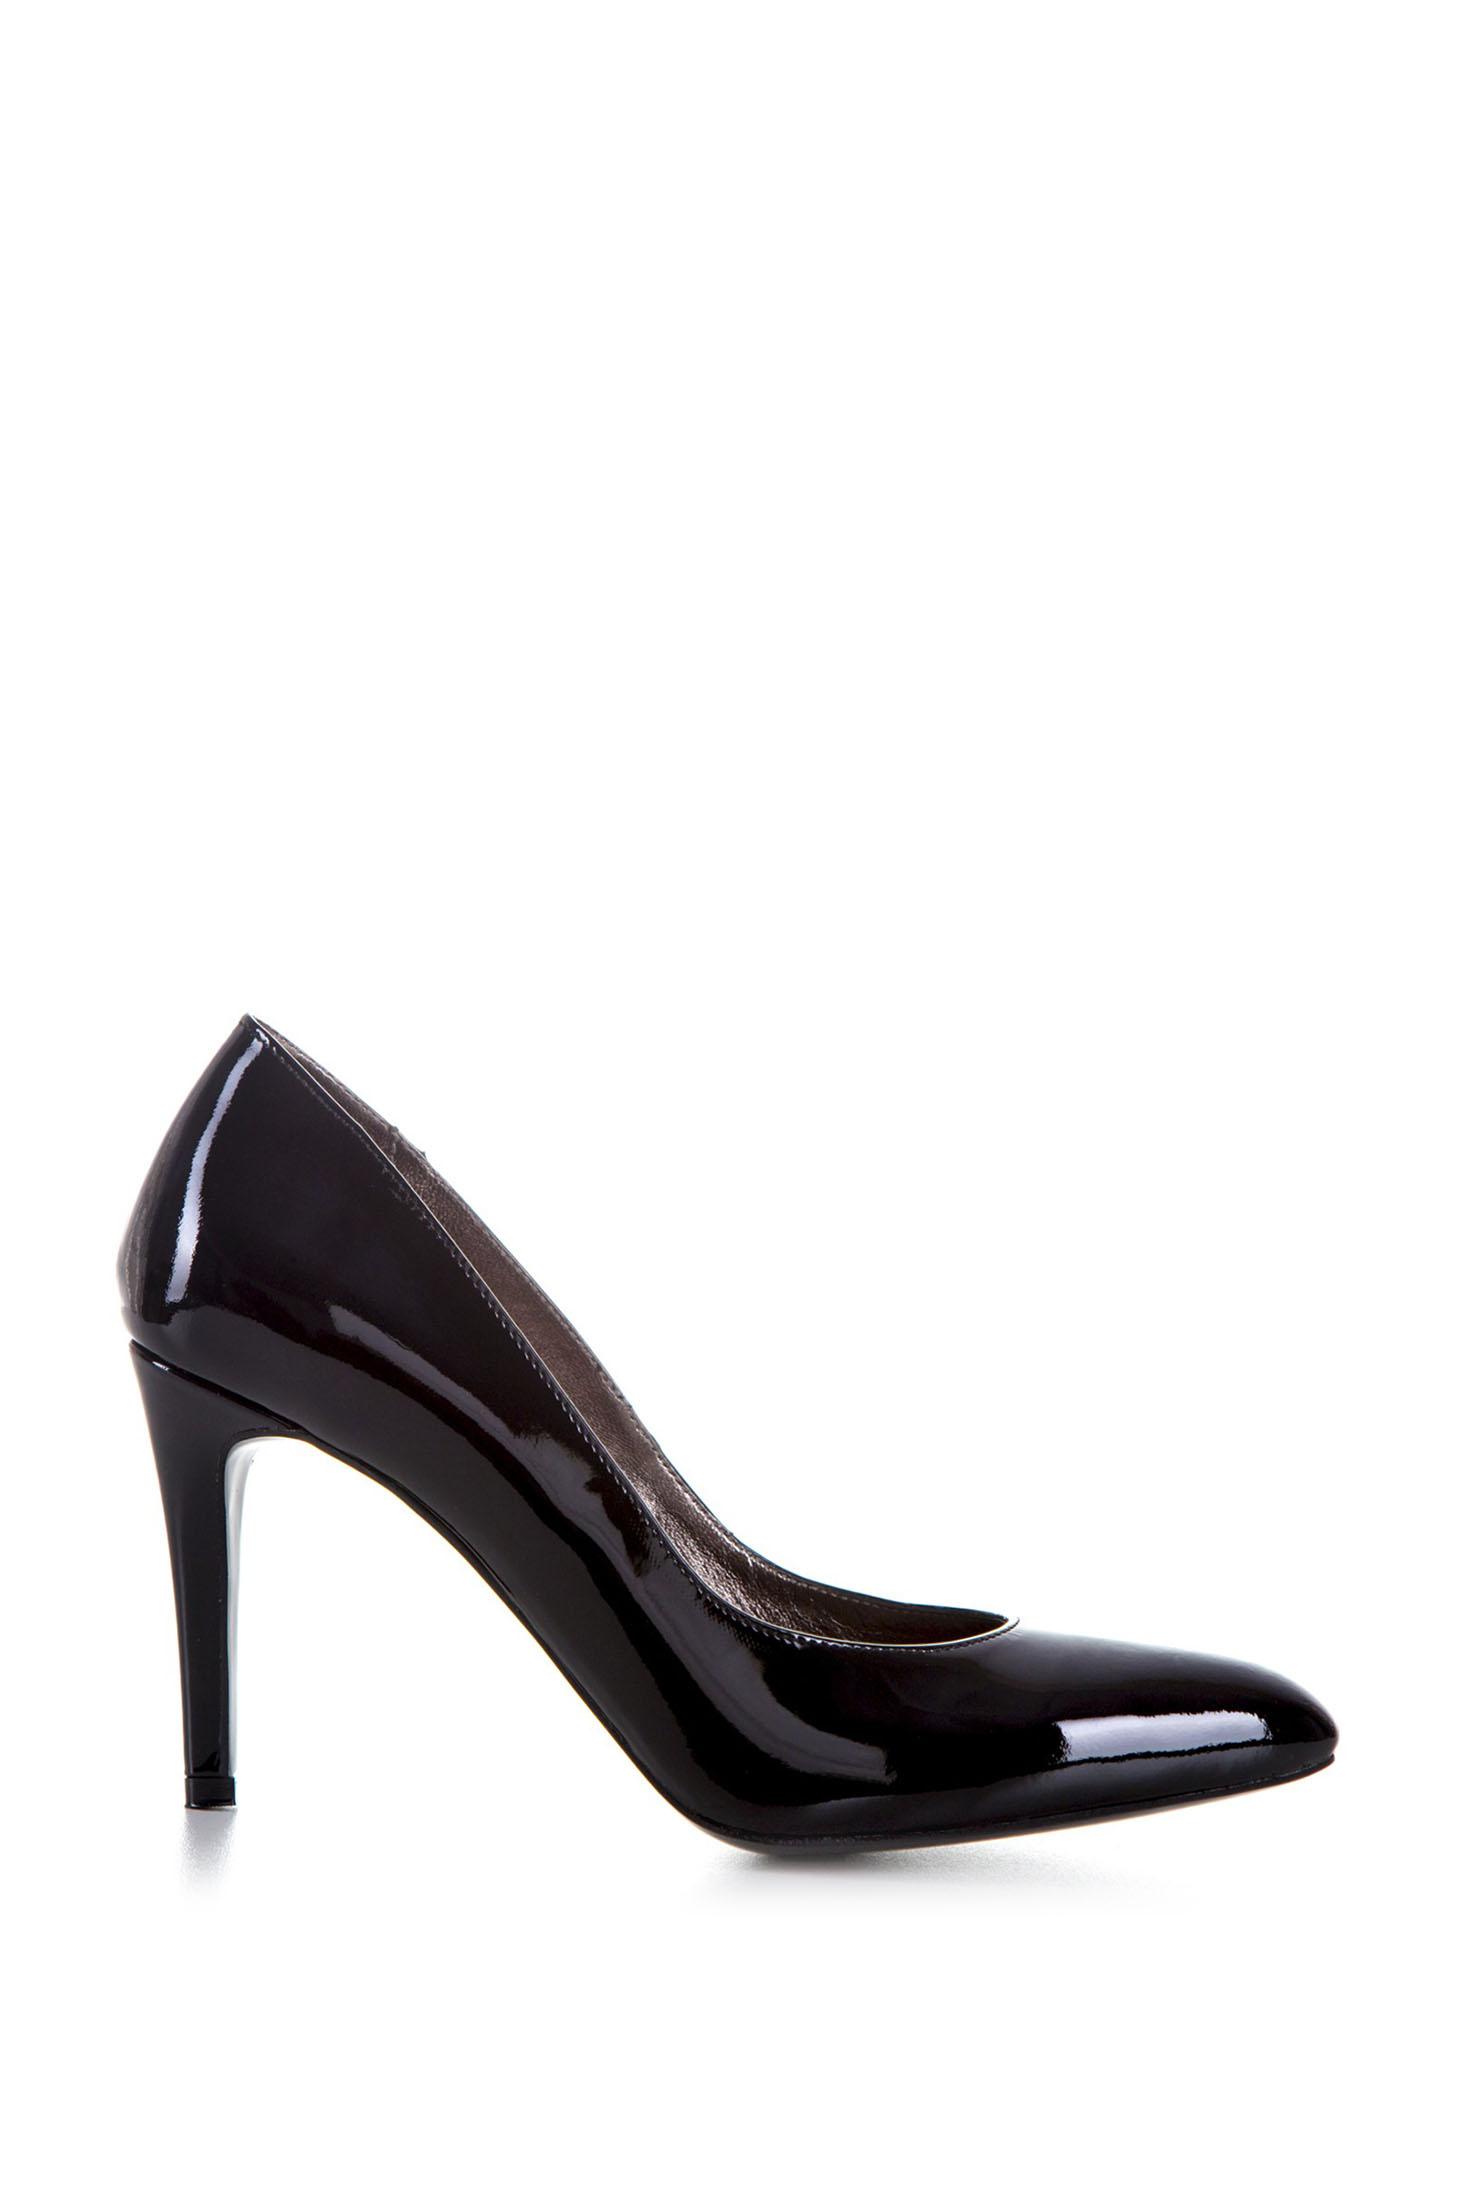 Pantofi stiletto negri din piele naturala cu varful usor ascutit